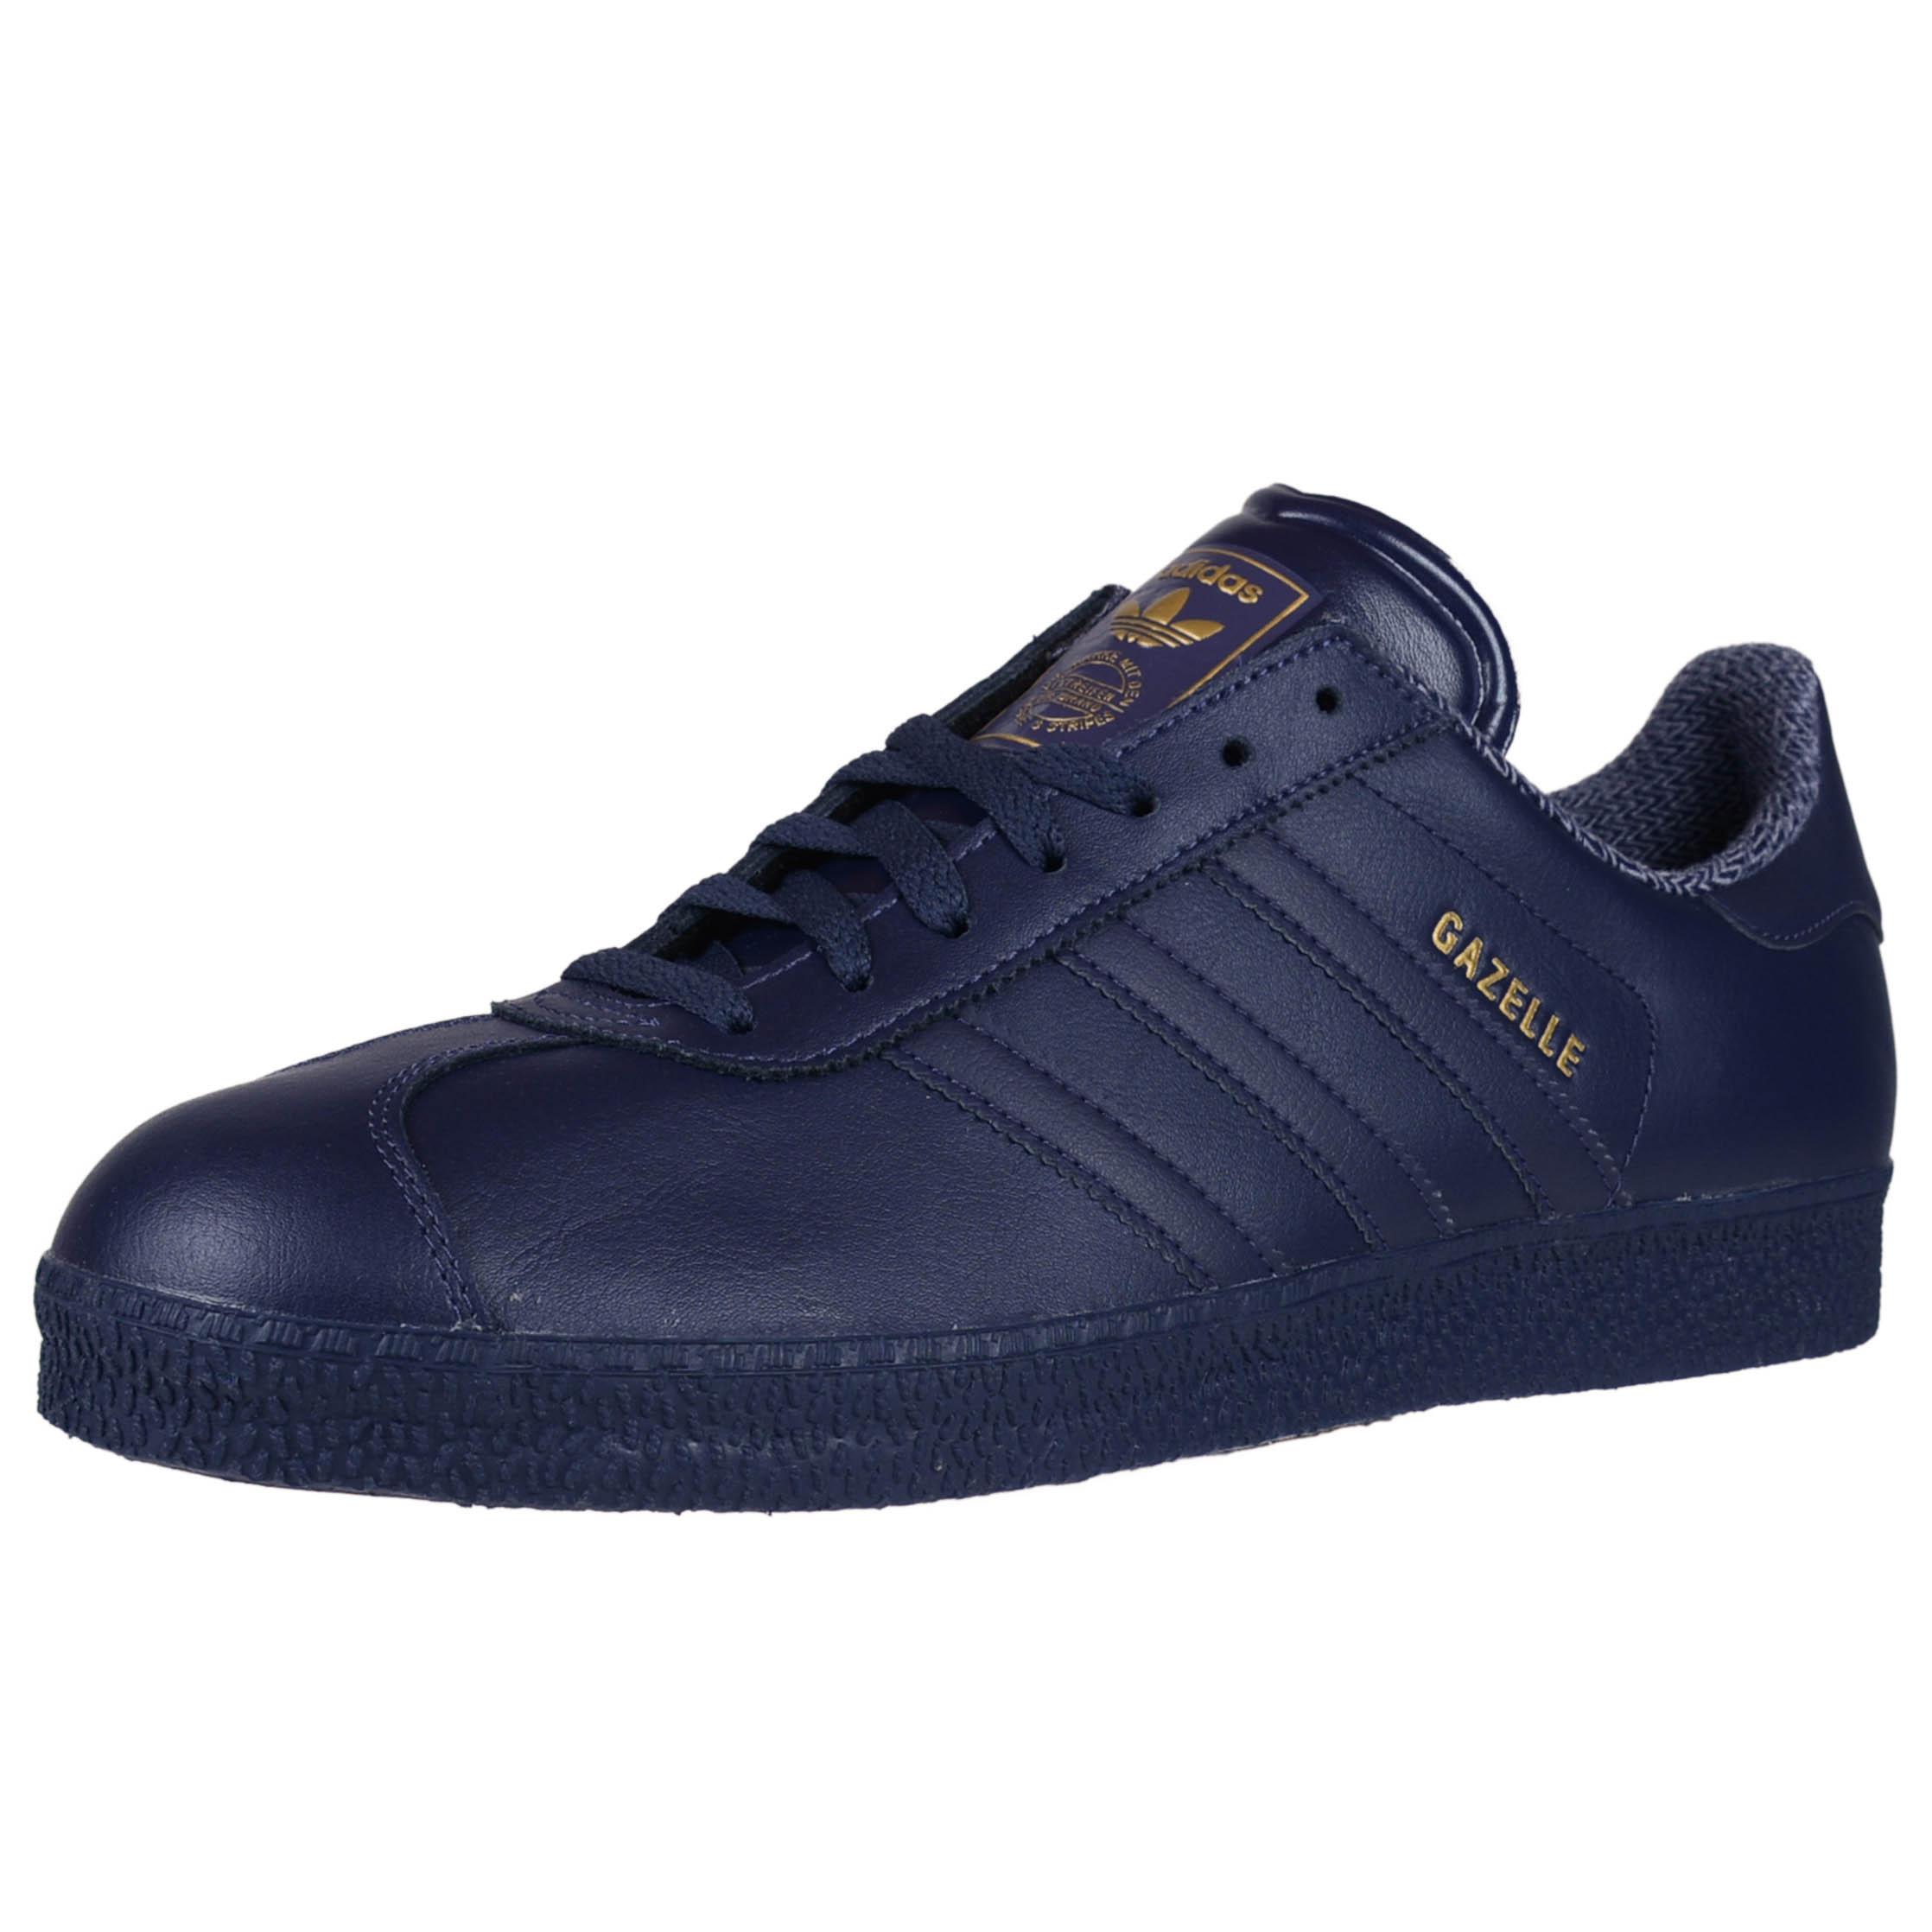 Mens Shoes adidas Originals Gazelle Legend Ink S10